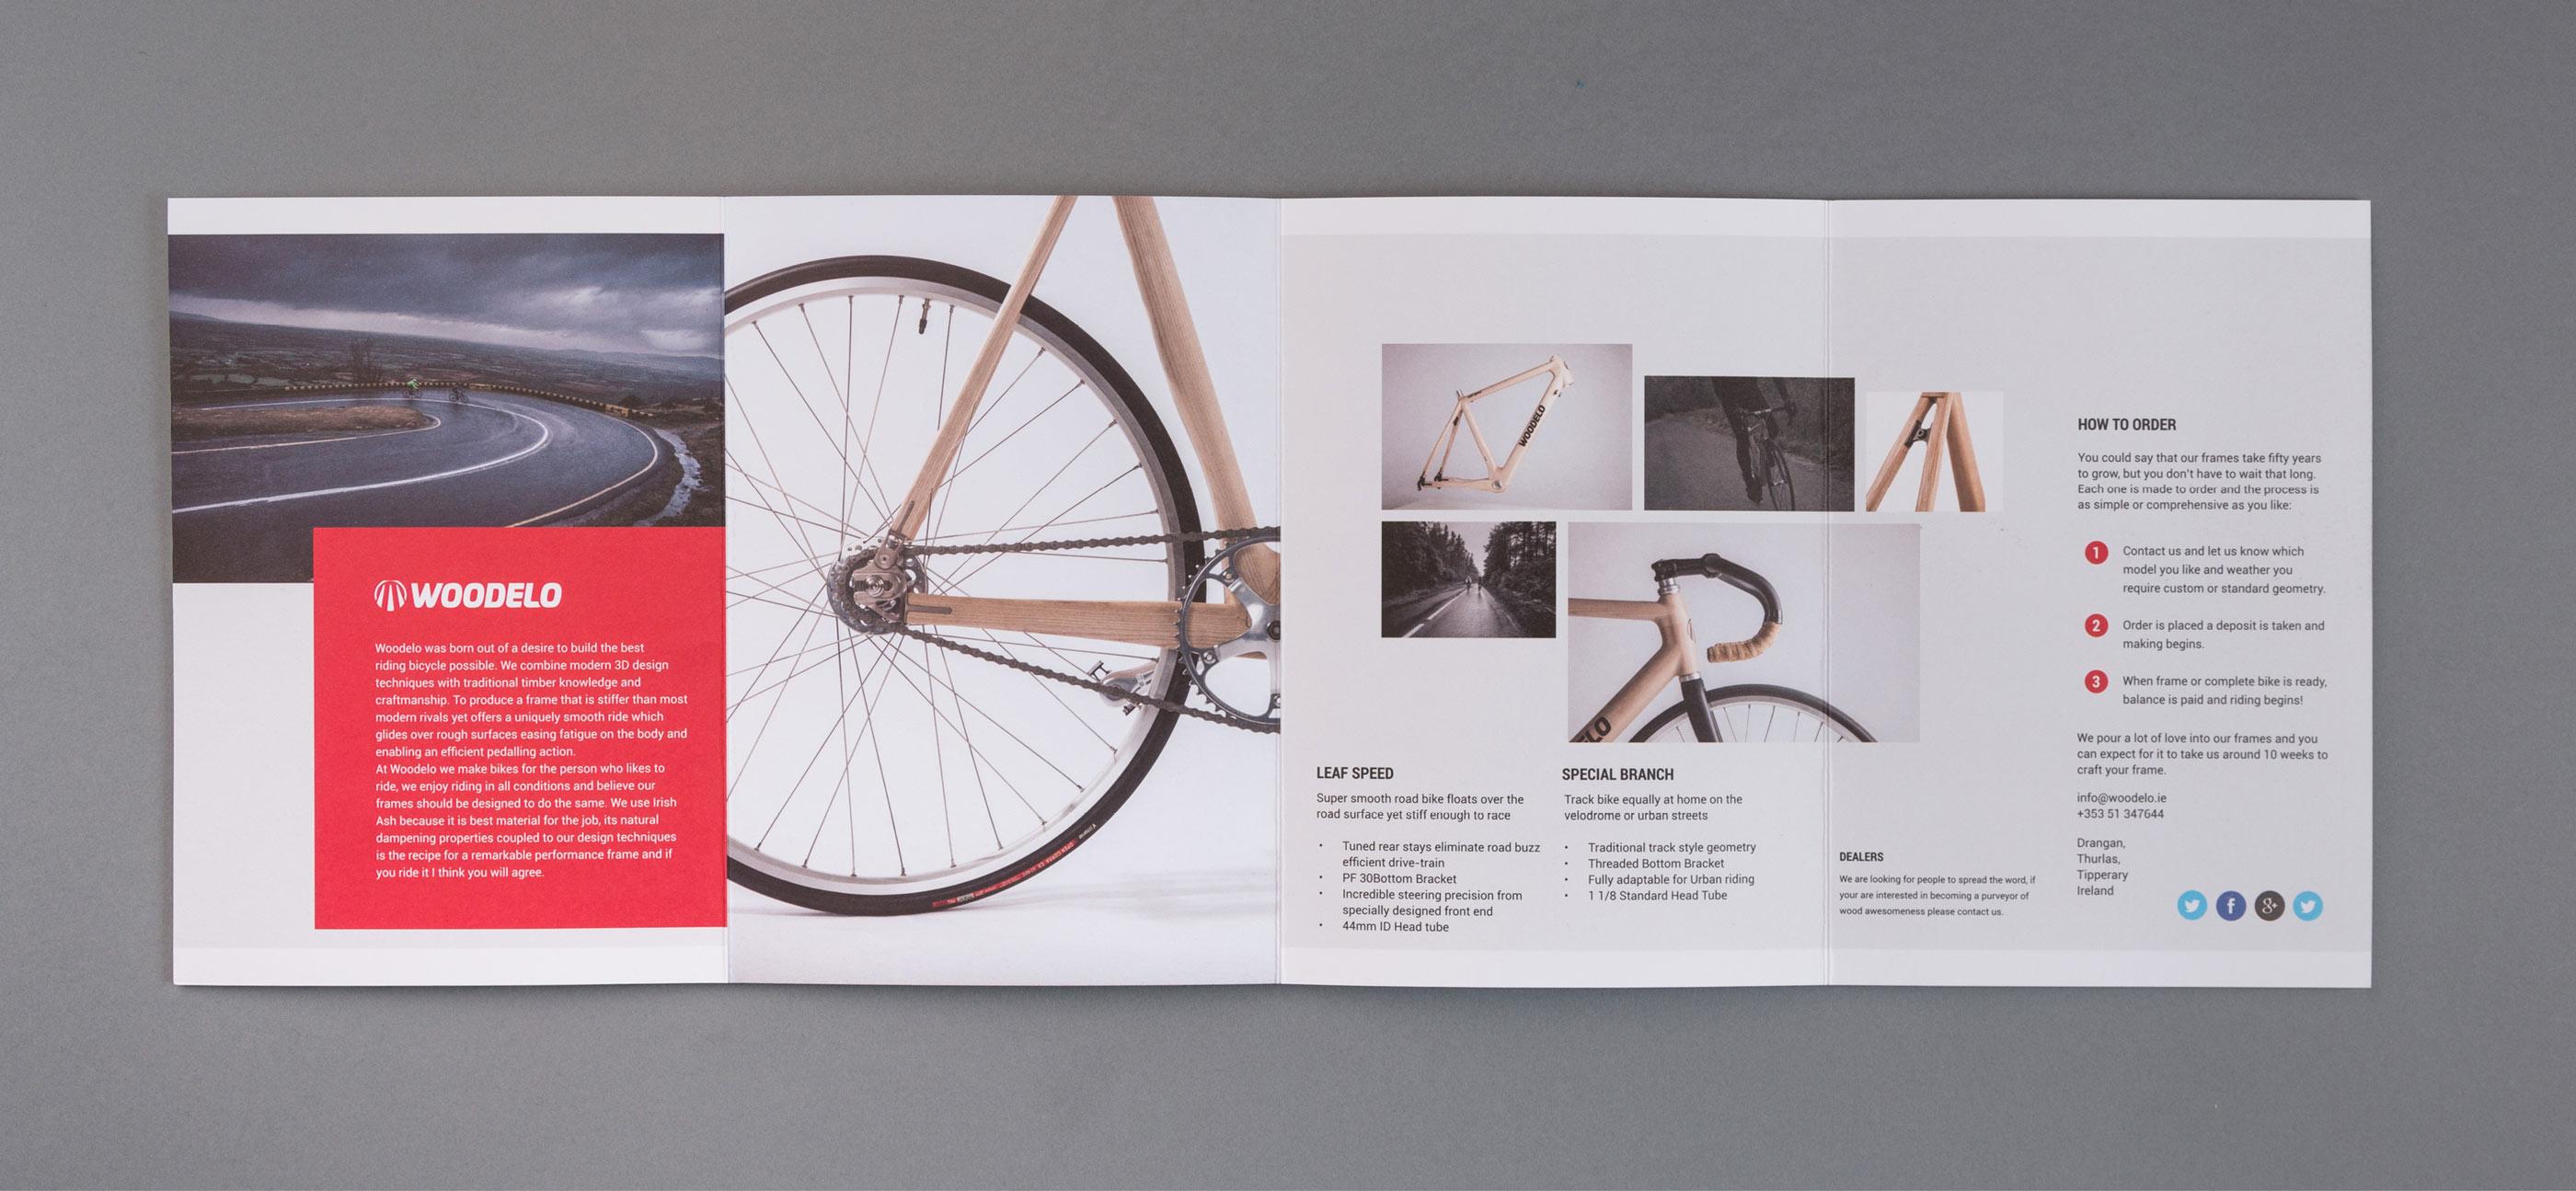 Woodelo brochure design by Piquant Limerick